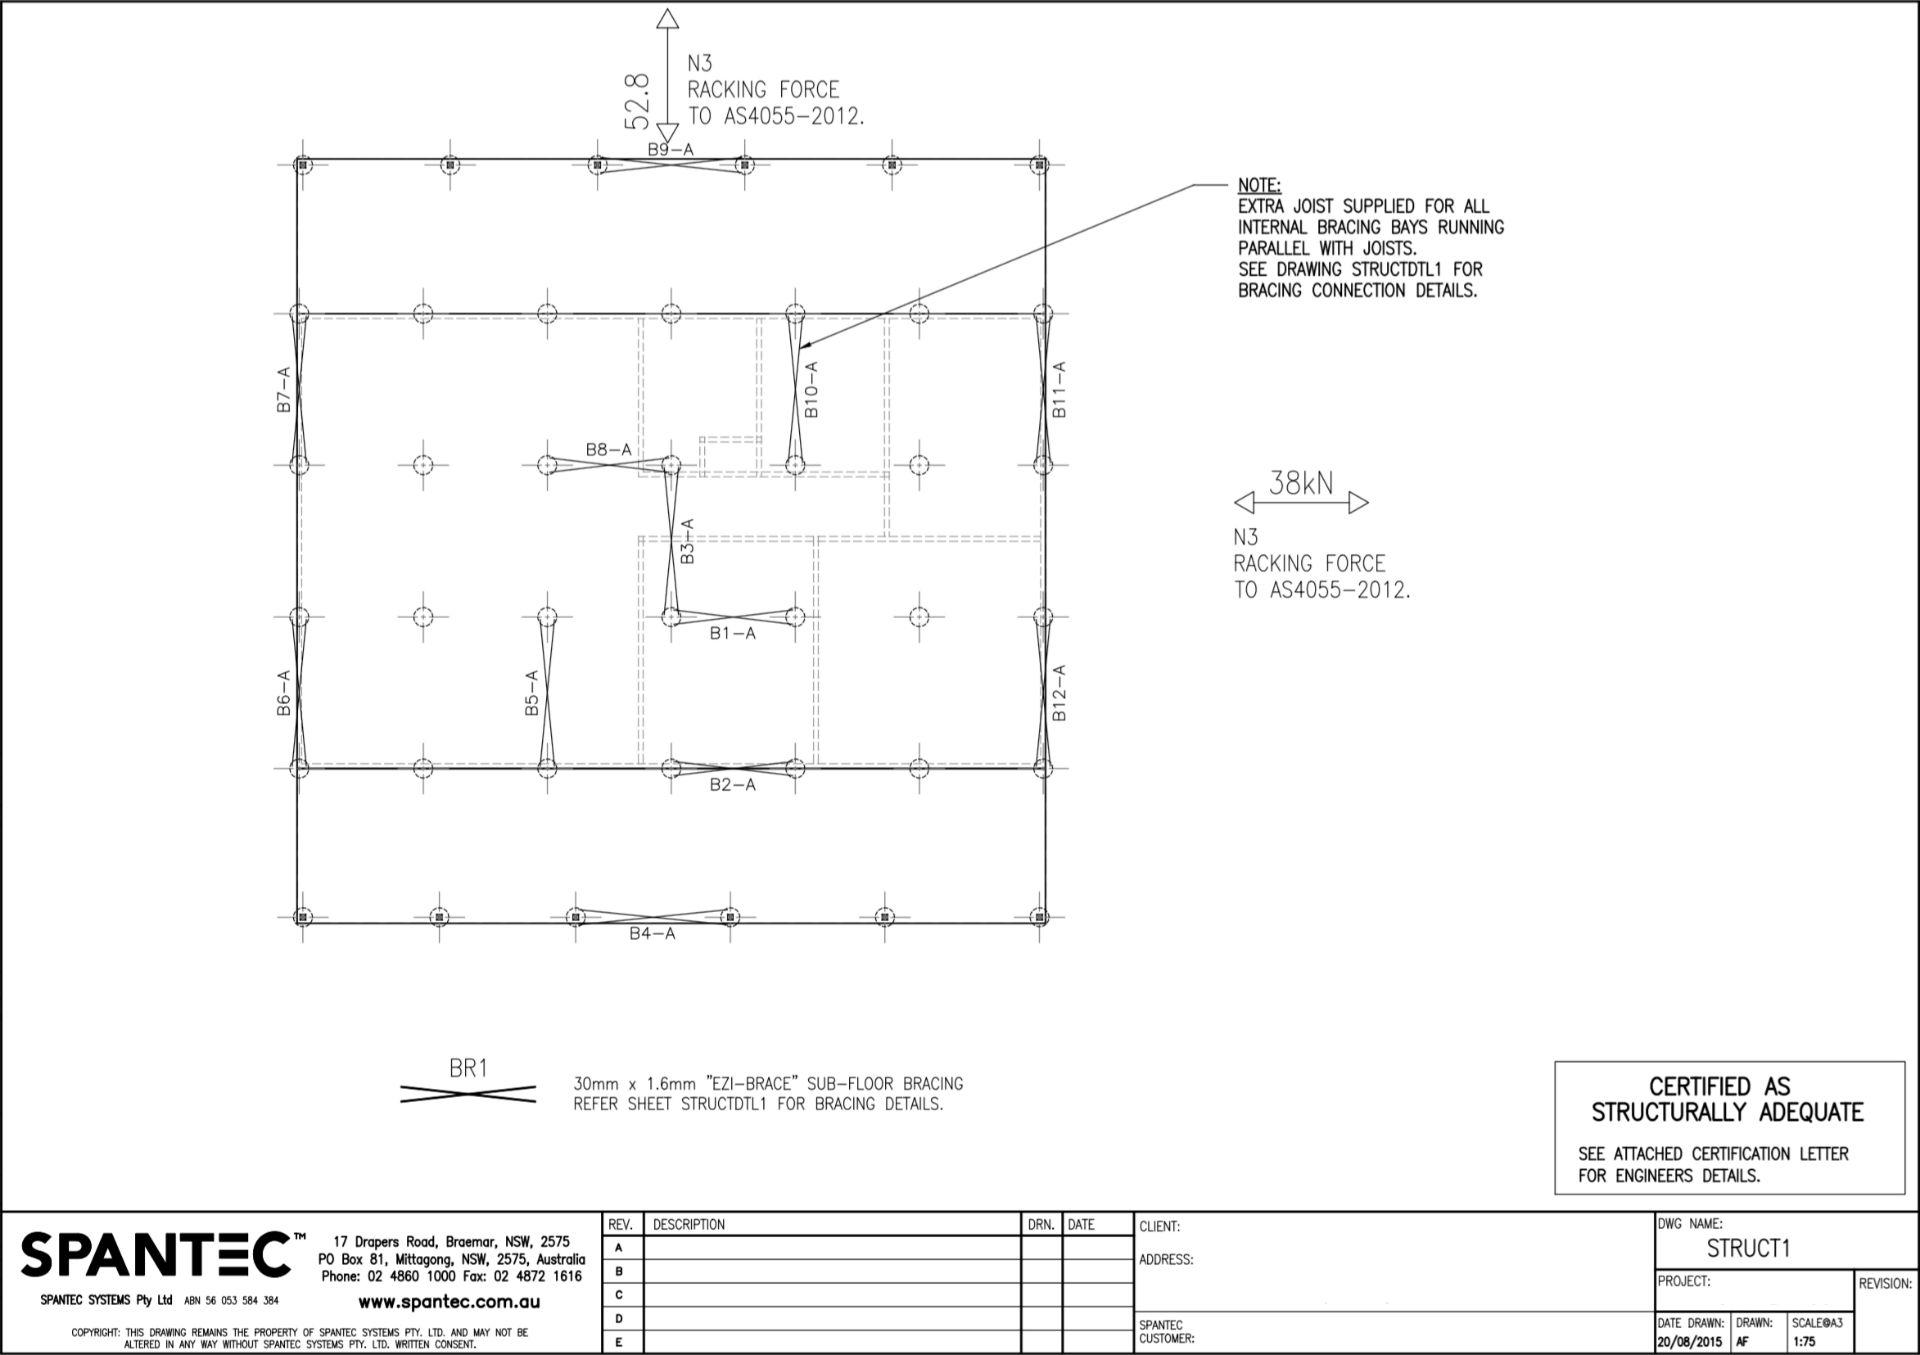 Bracing layout